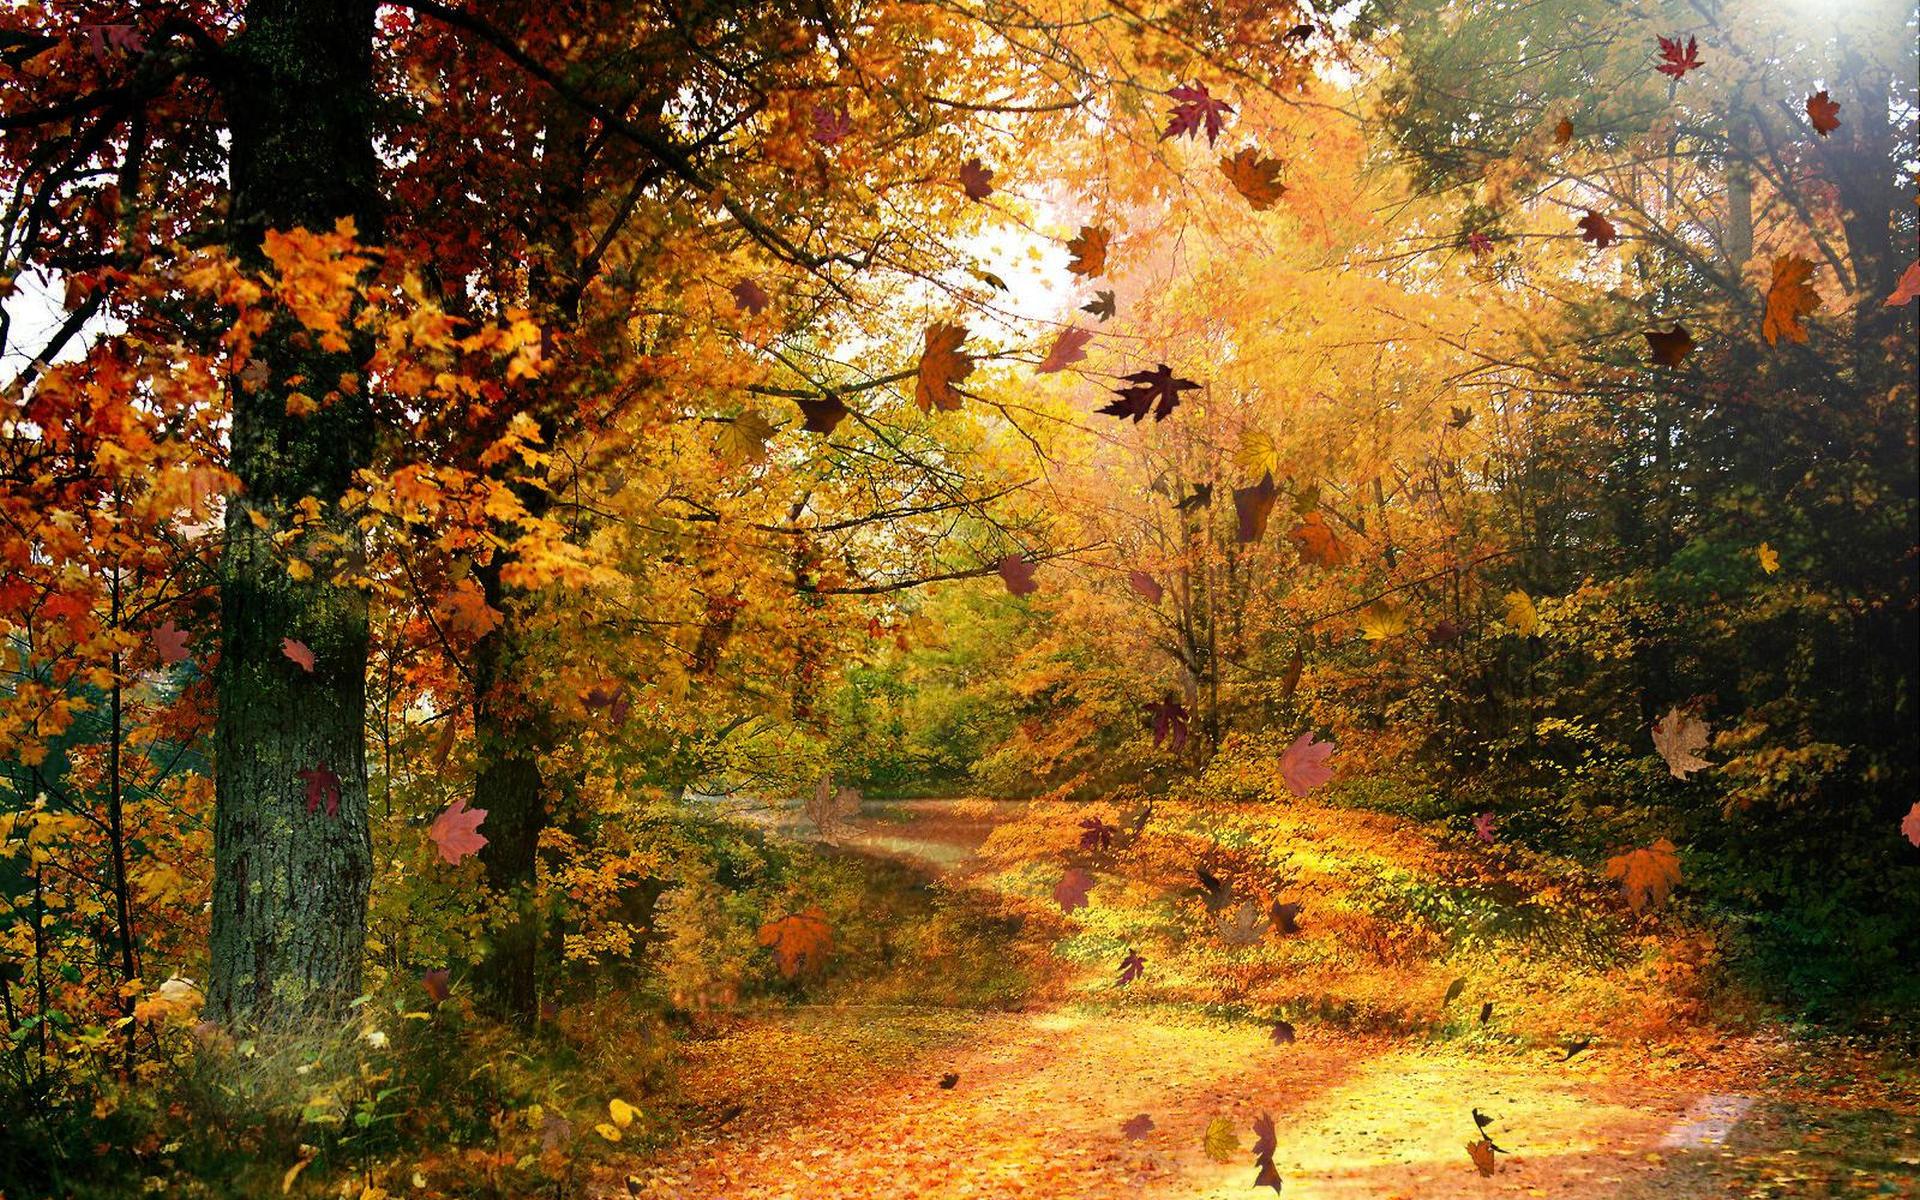 Rezultat slike za autumn wind falling leaves